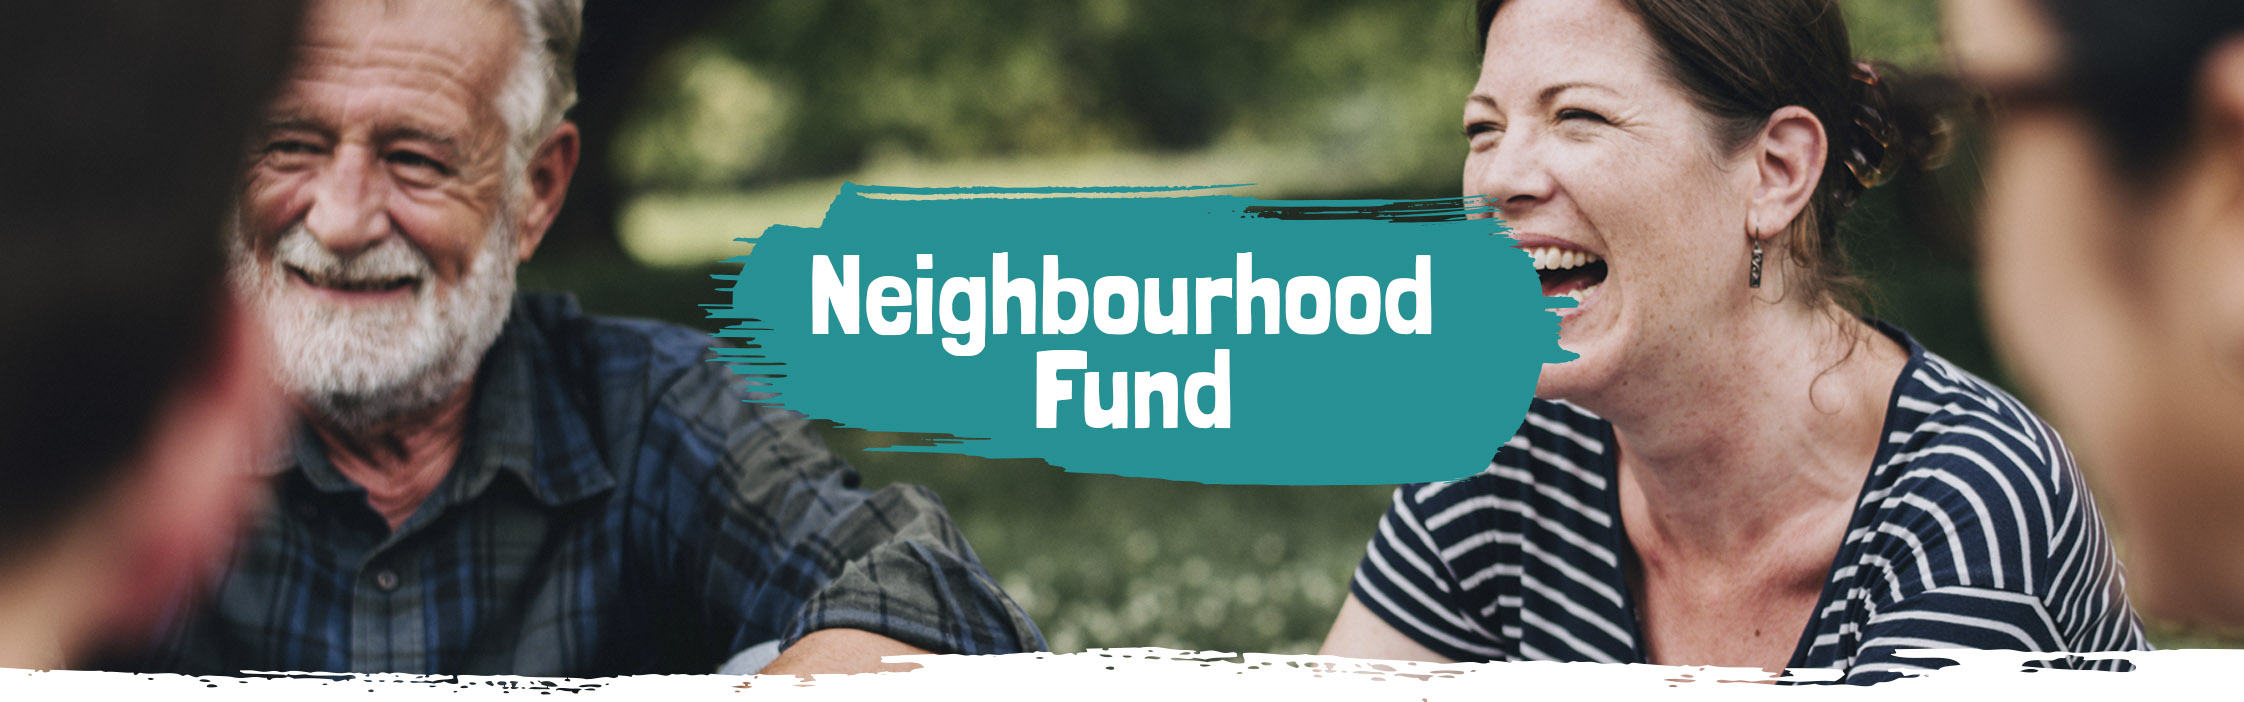 neighbourhood-fund.jpg